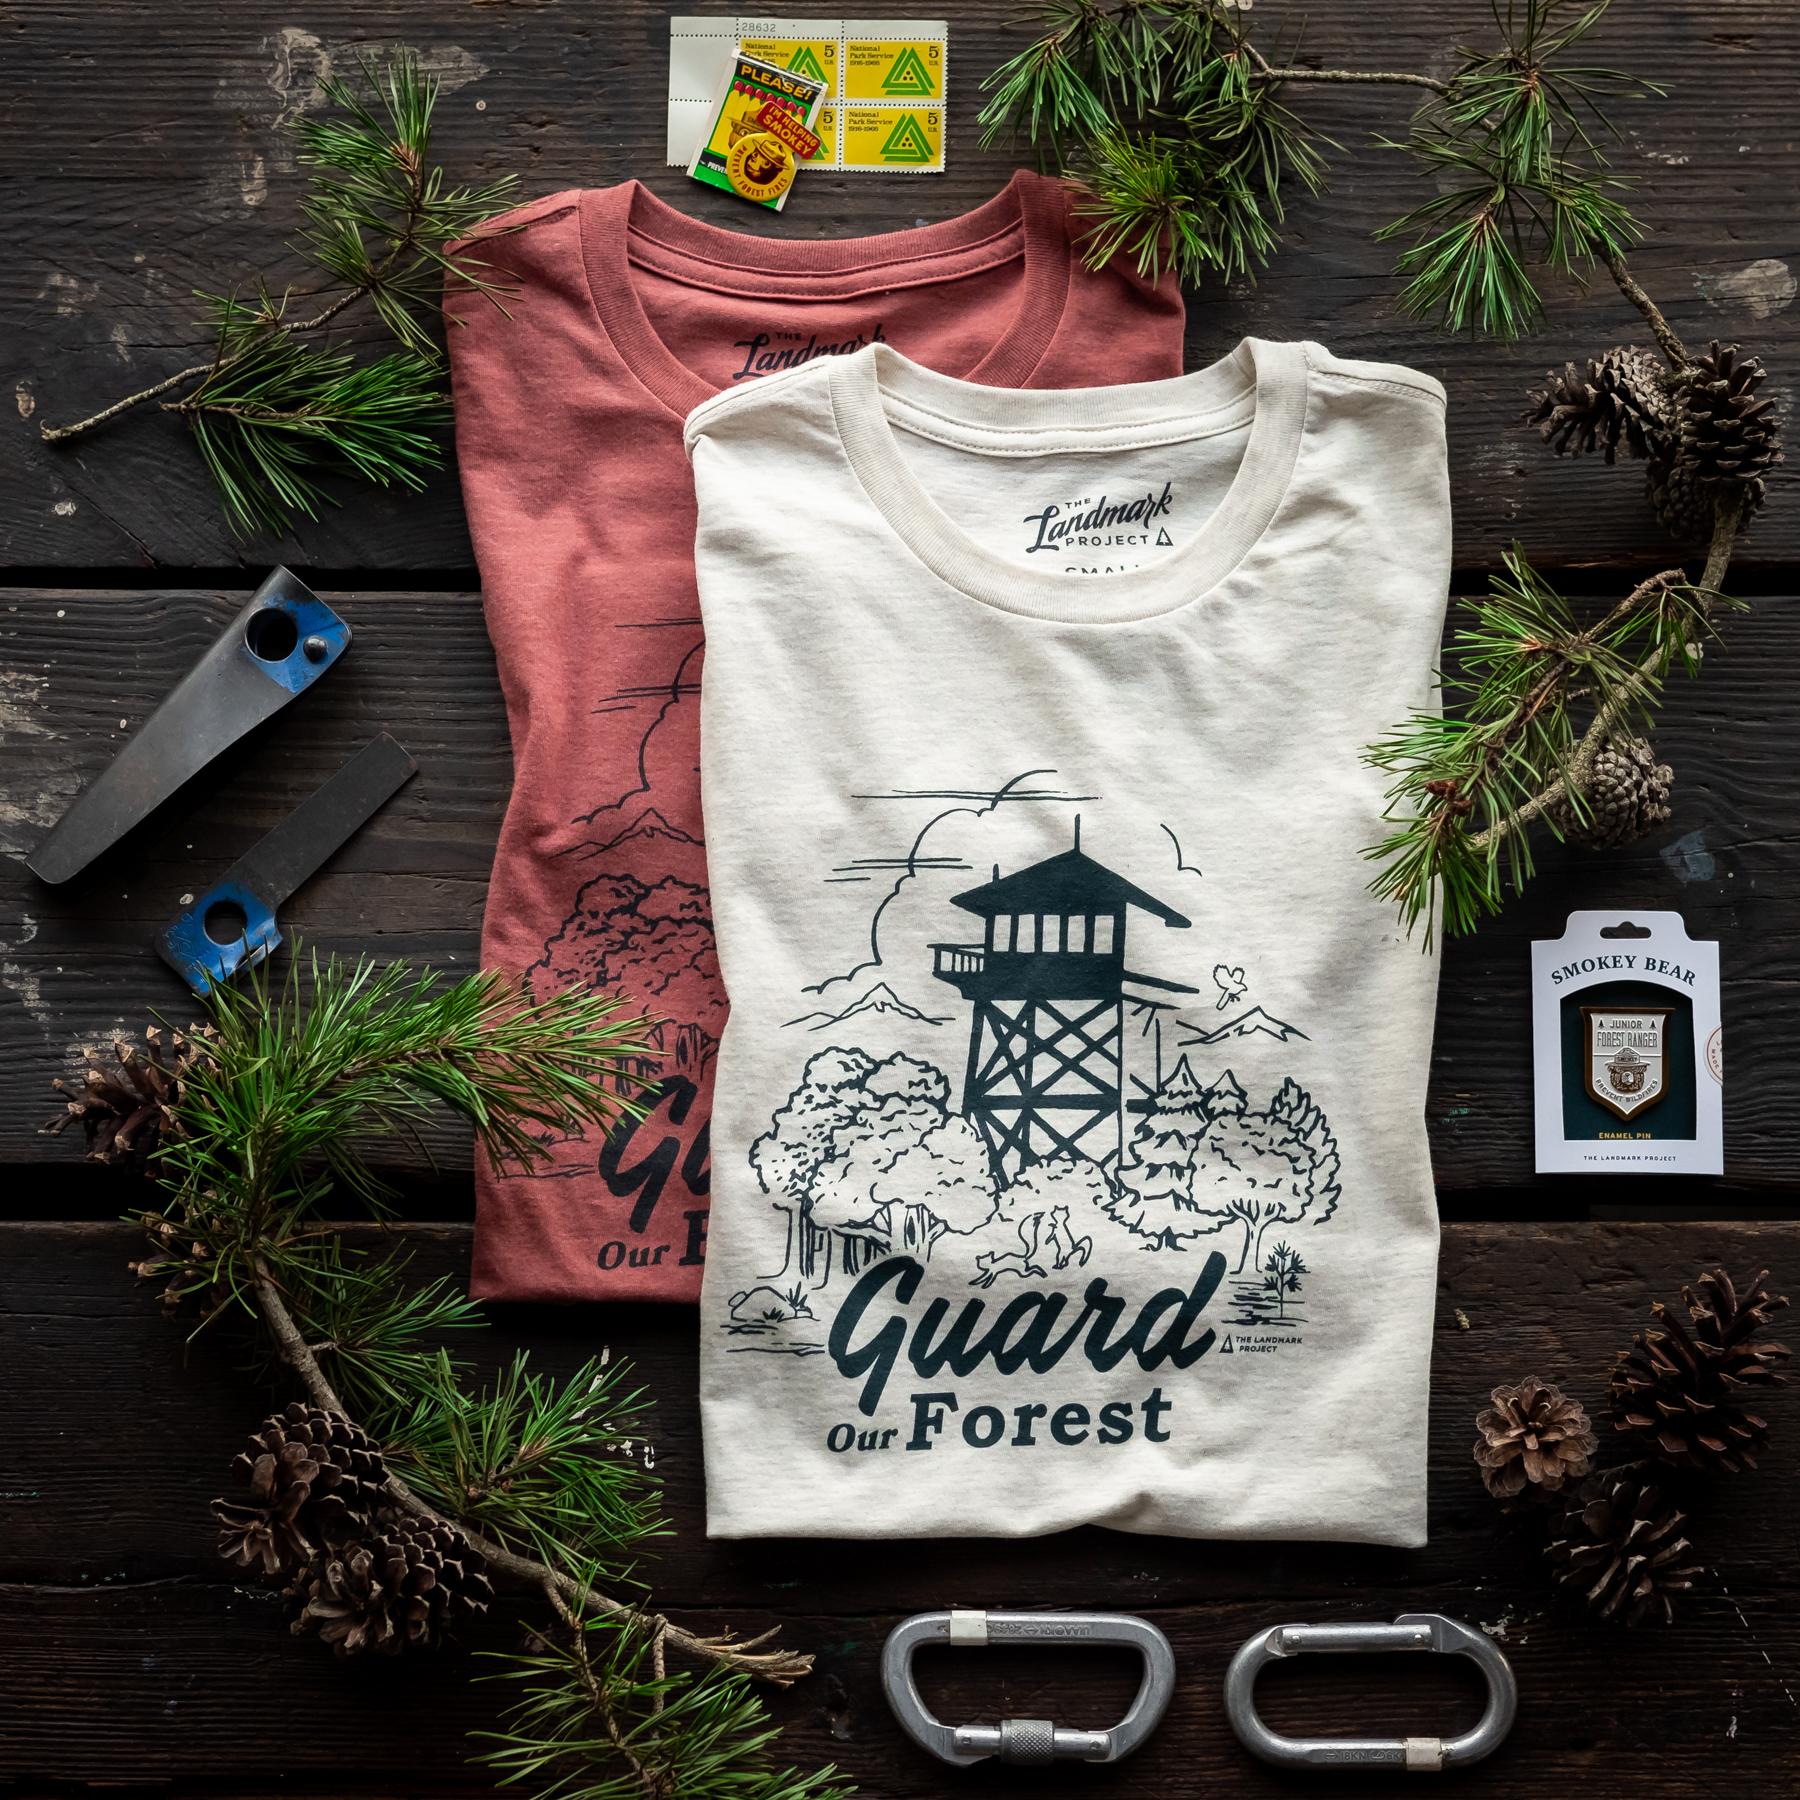 smokey-bear-guard-forest-03.jpg